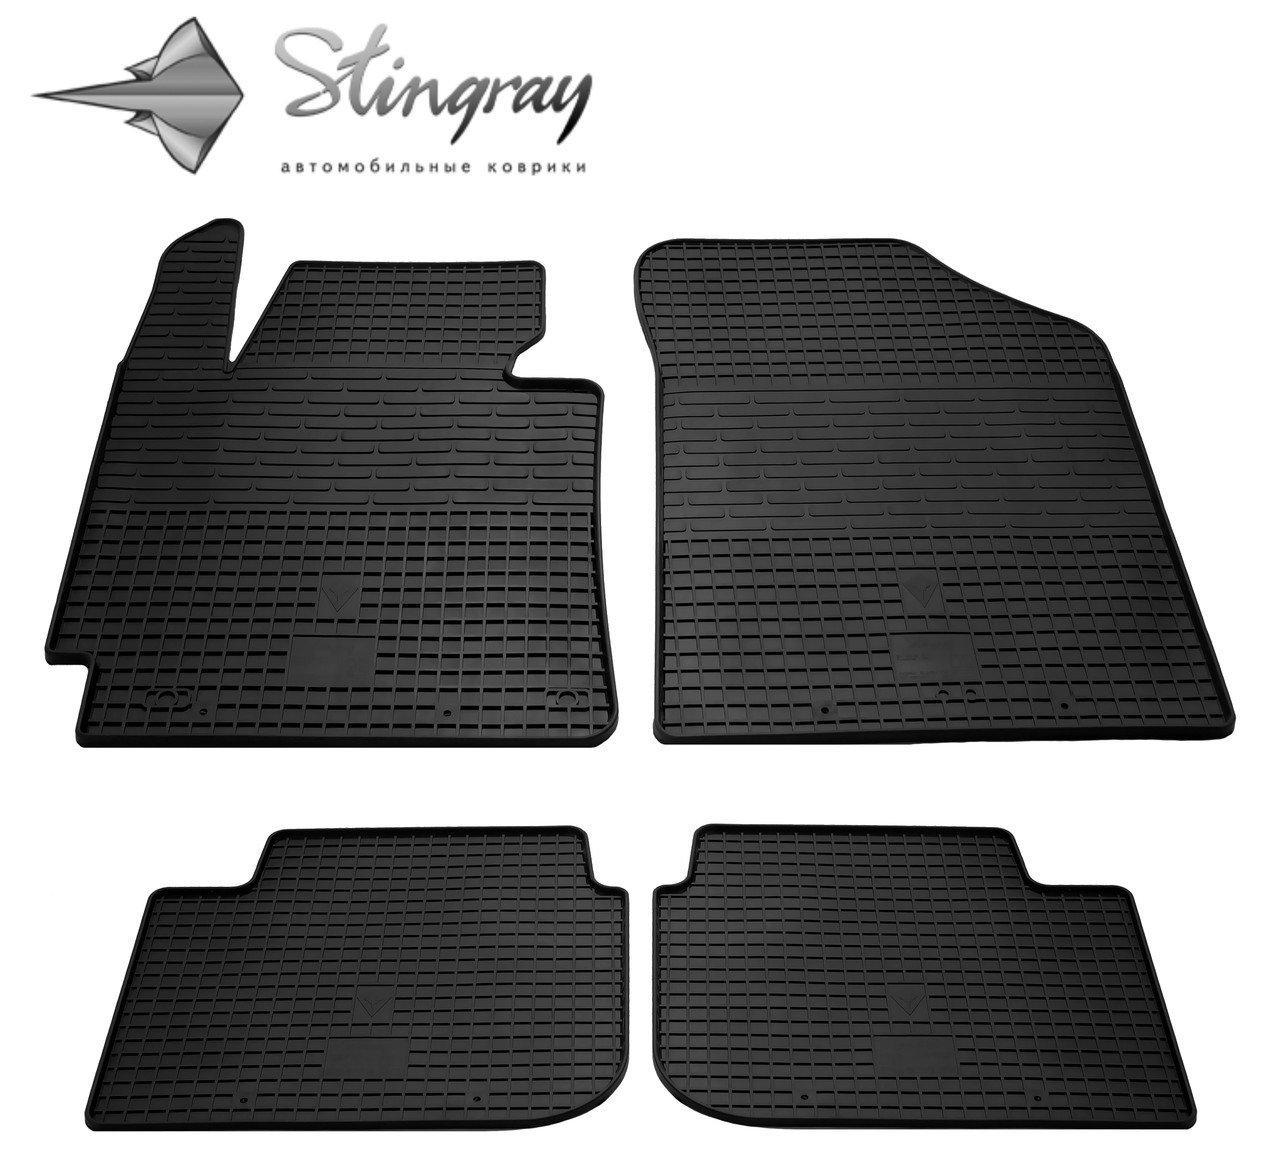 Автомобильные коврики Kia Cerato 2013- Stingray